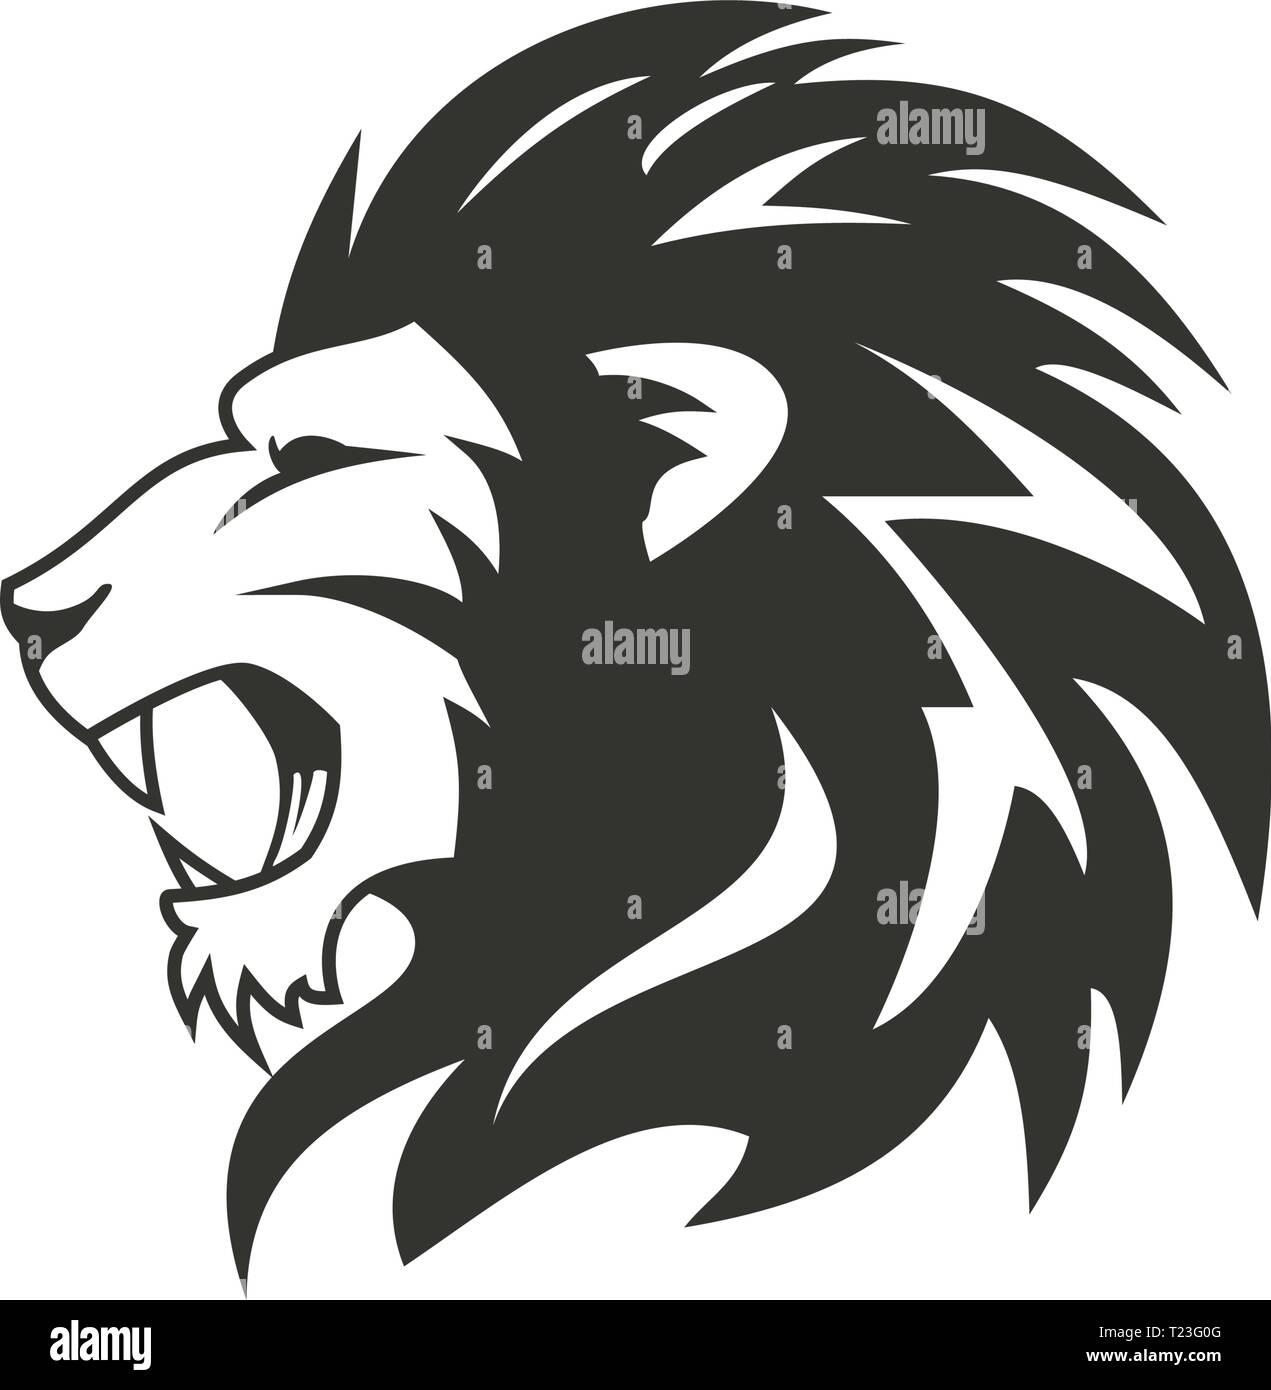 Heraldic lion logo design Stock Vector Art & Illustration